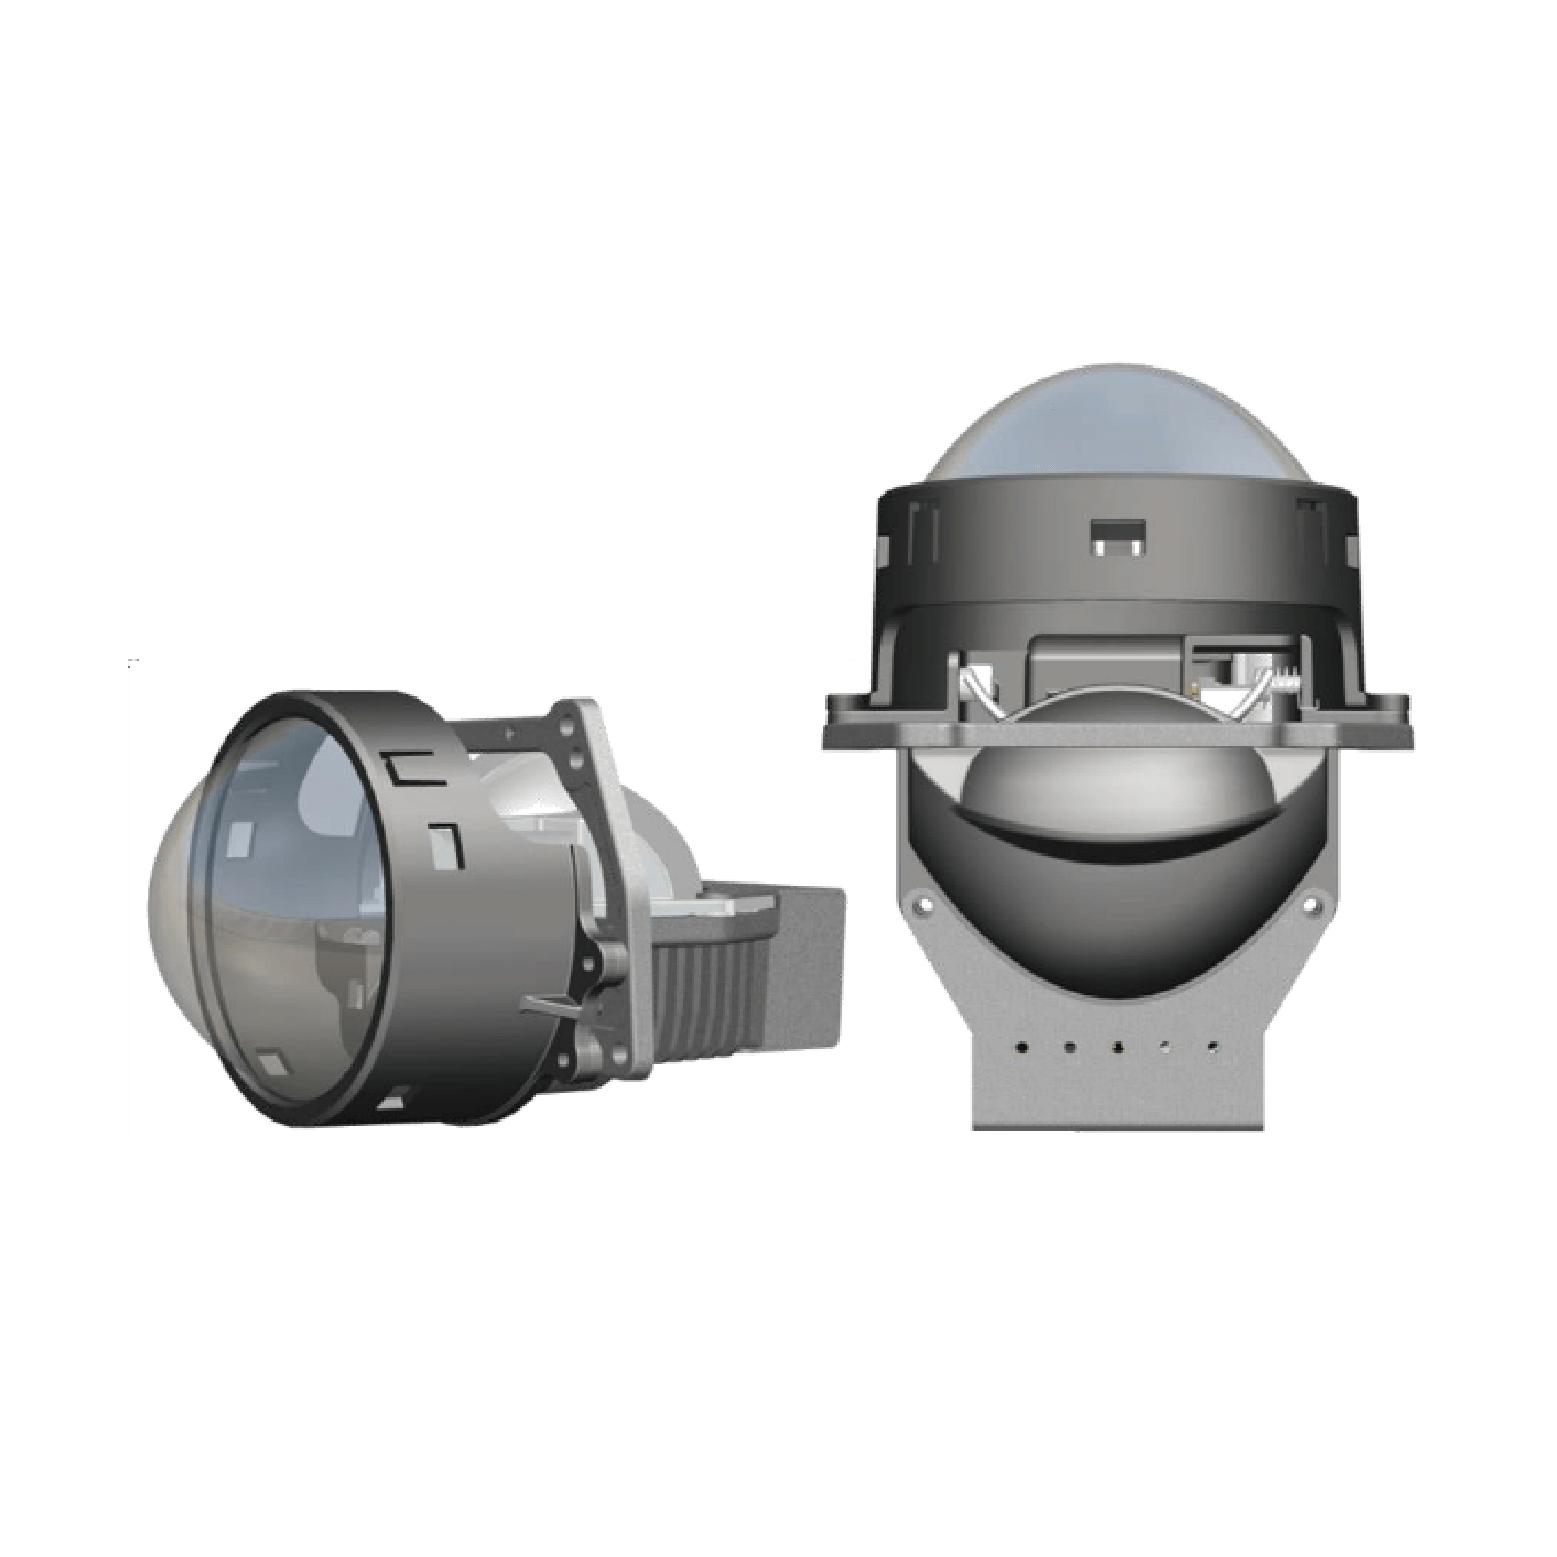 XBright X7 Bi-Led Projector Headlight Lens